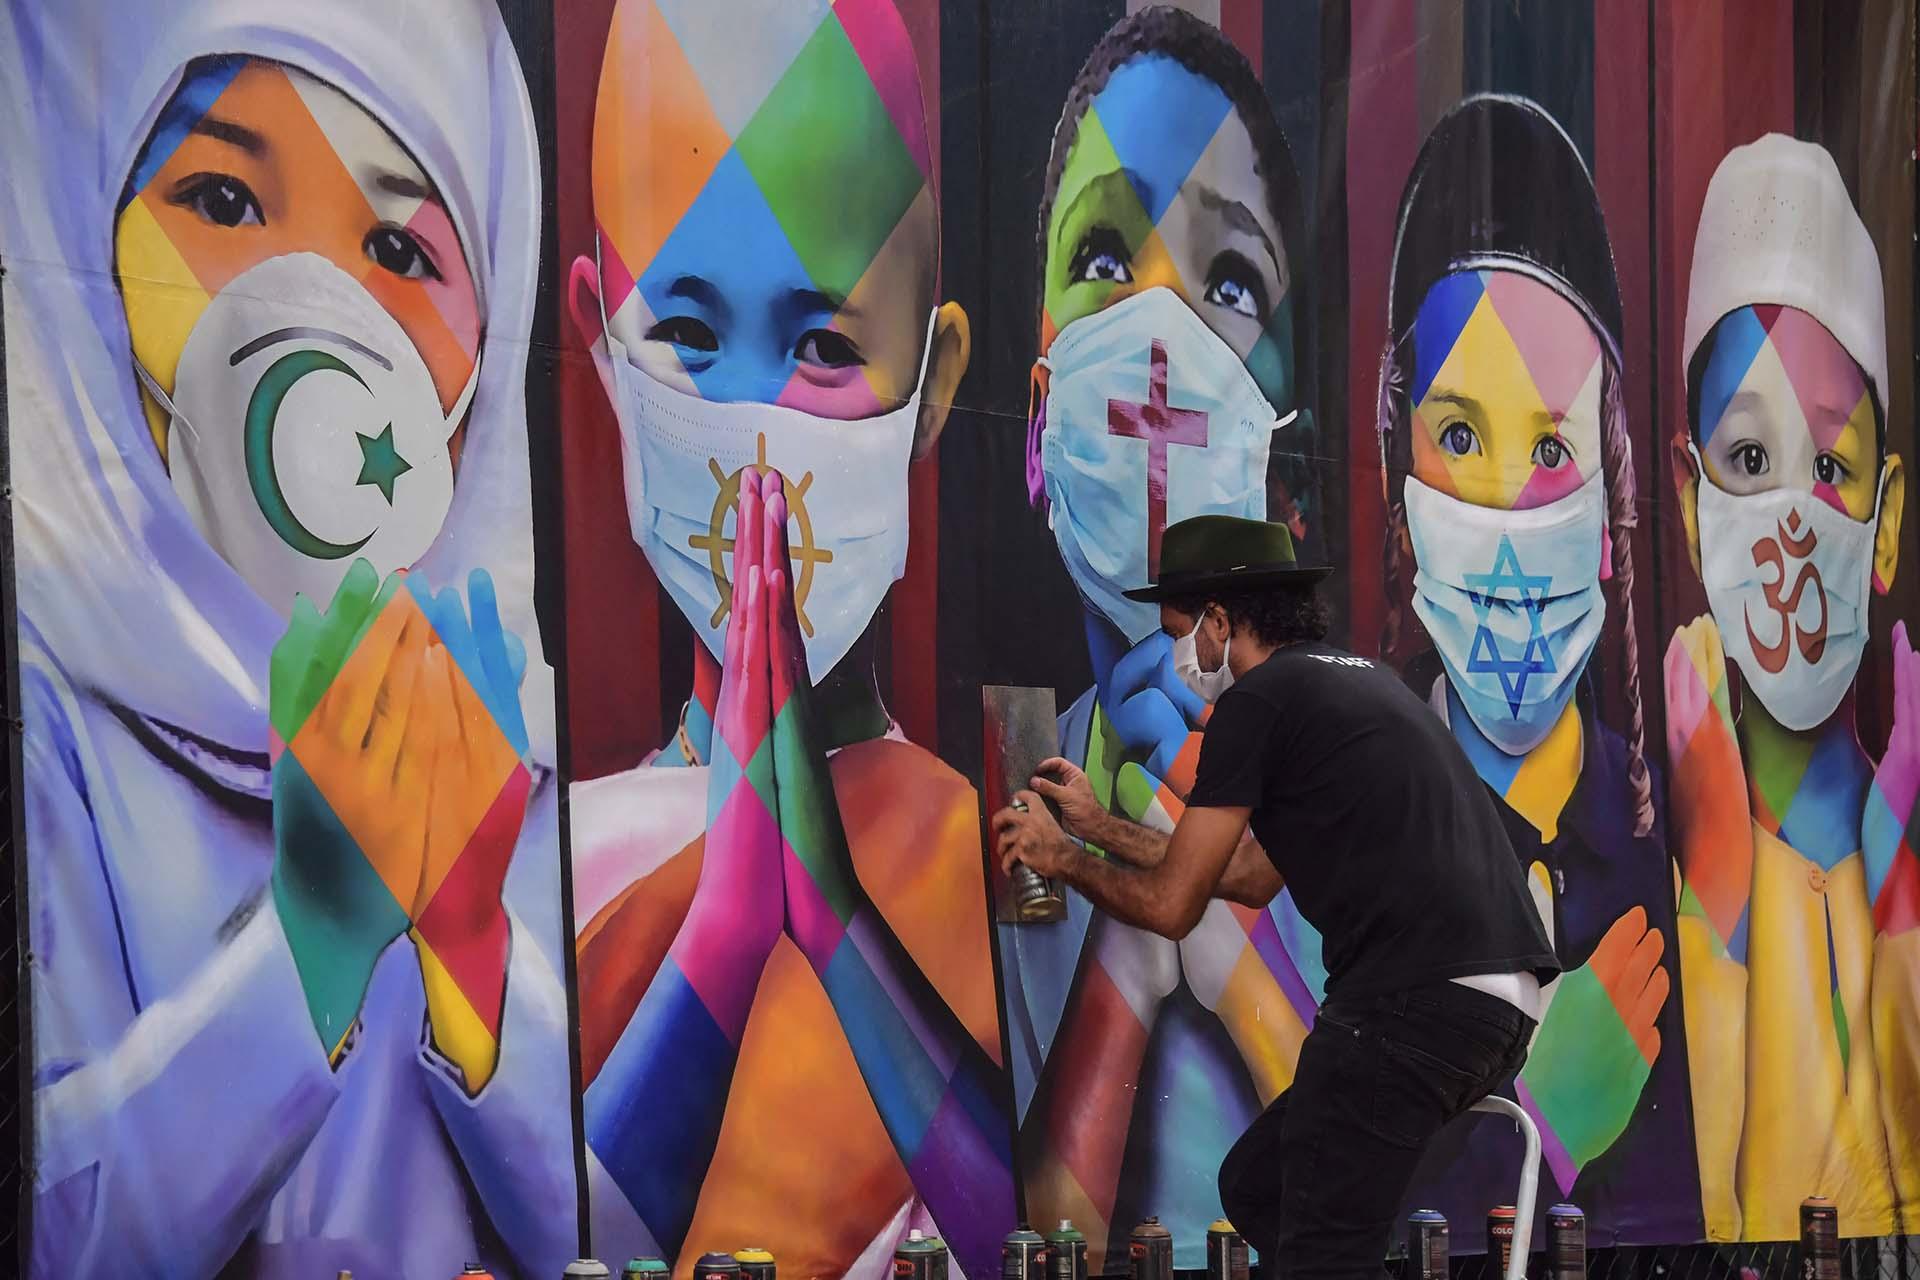 El artista brasileño Eduardo Kobra termina su mural